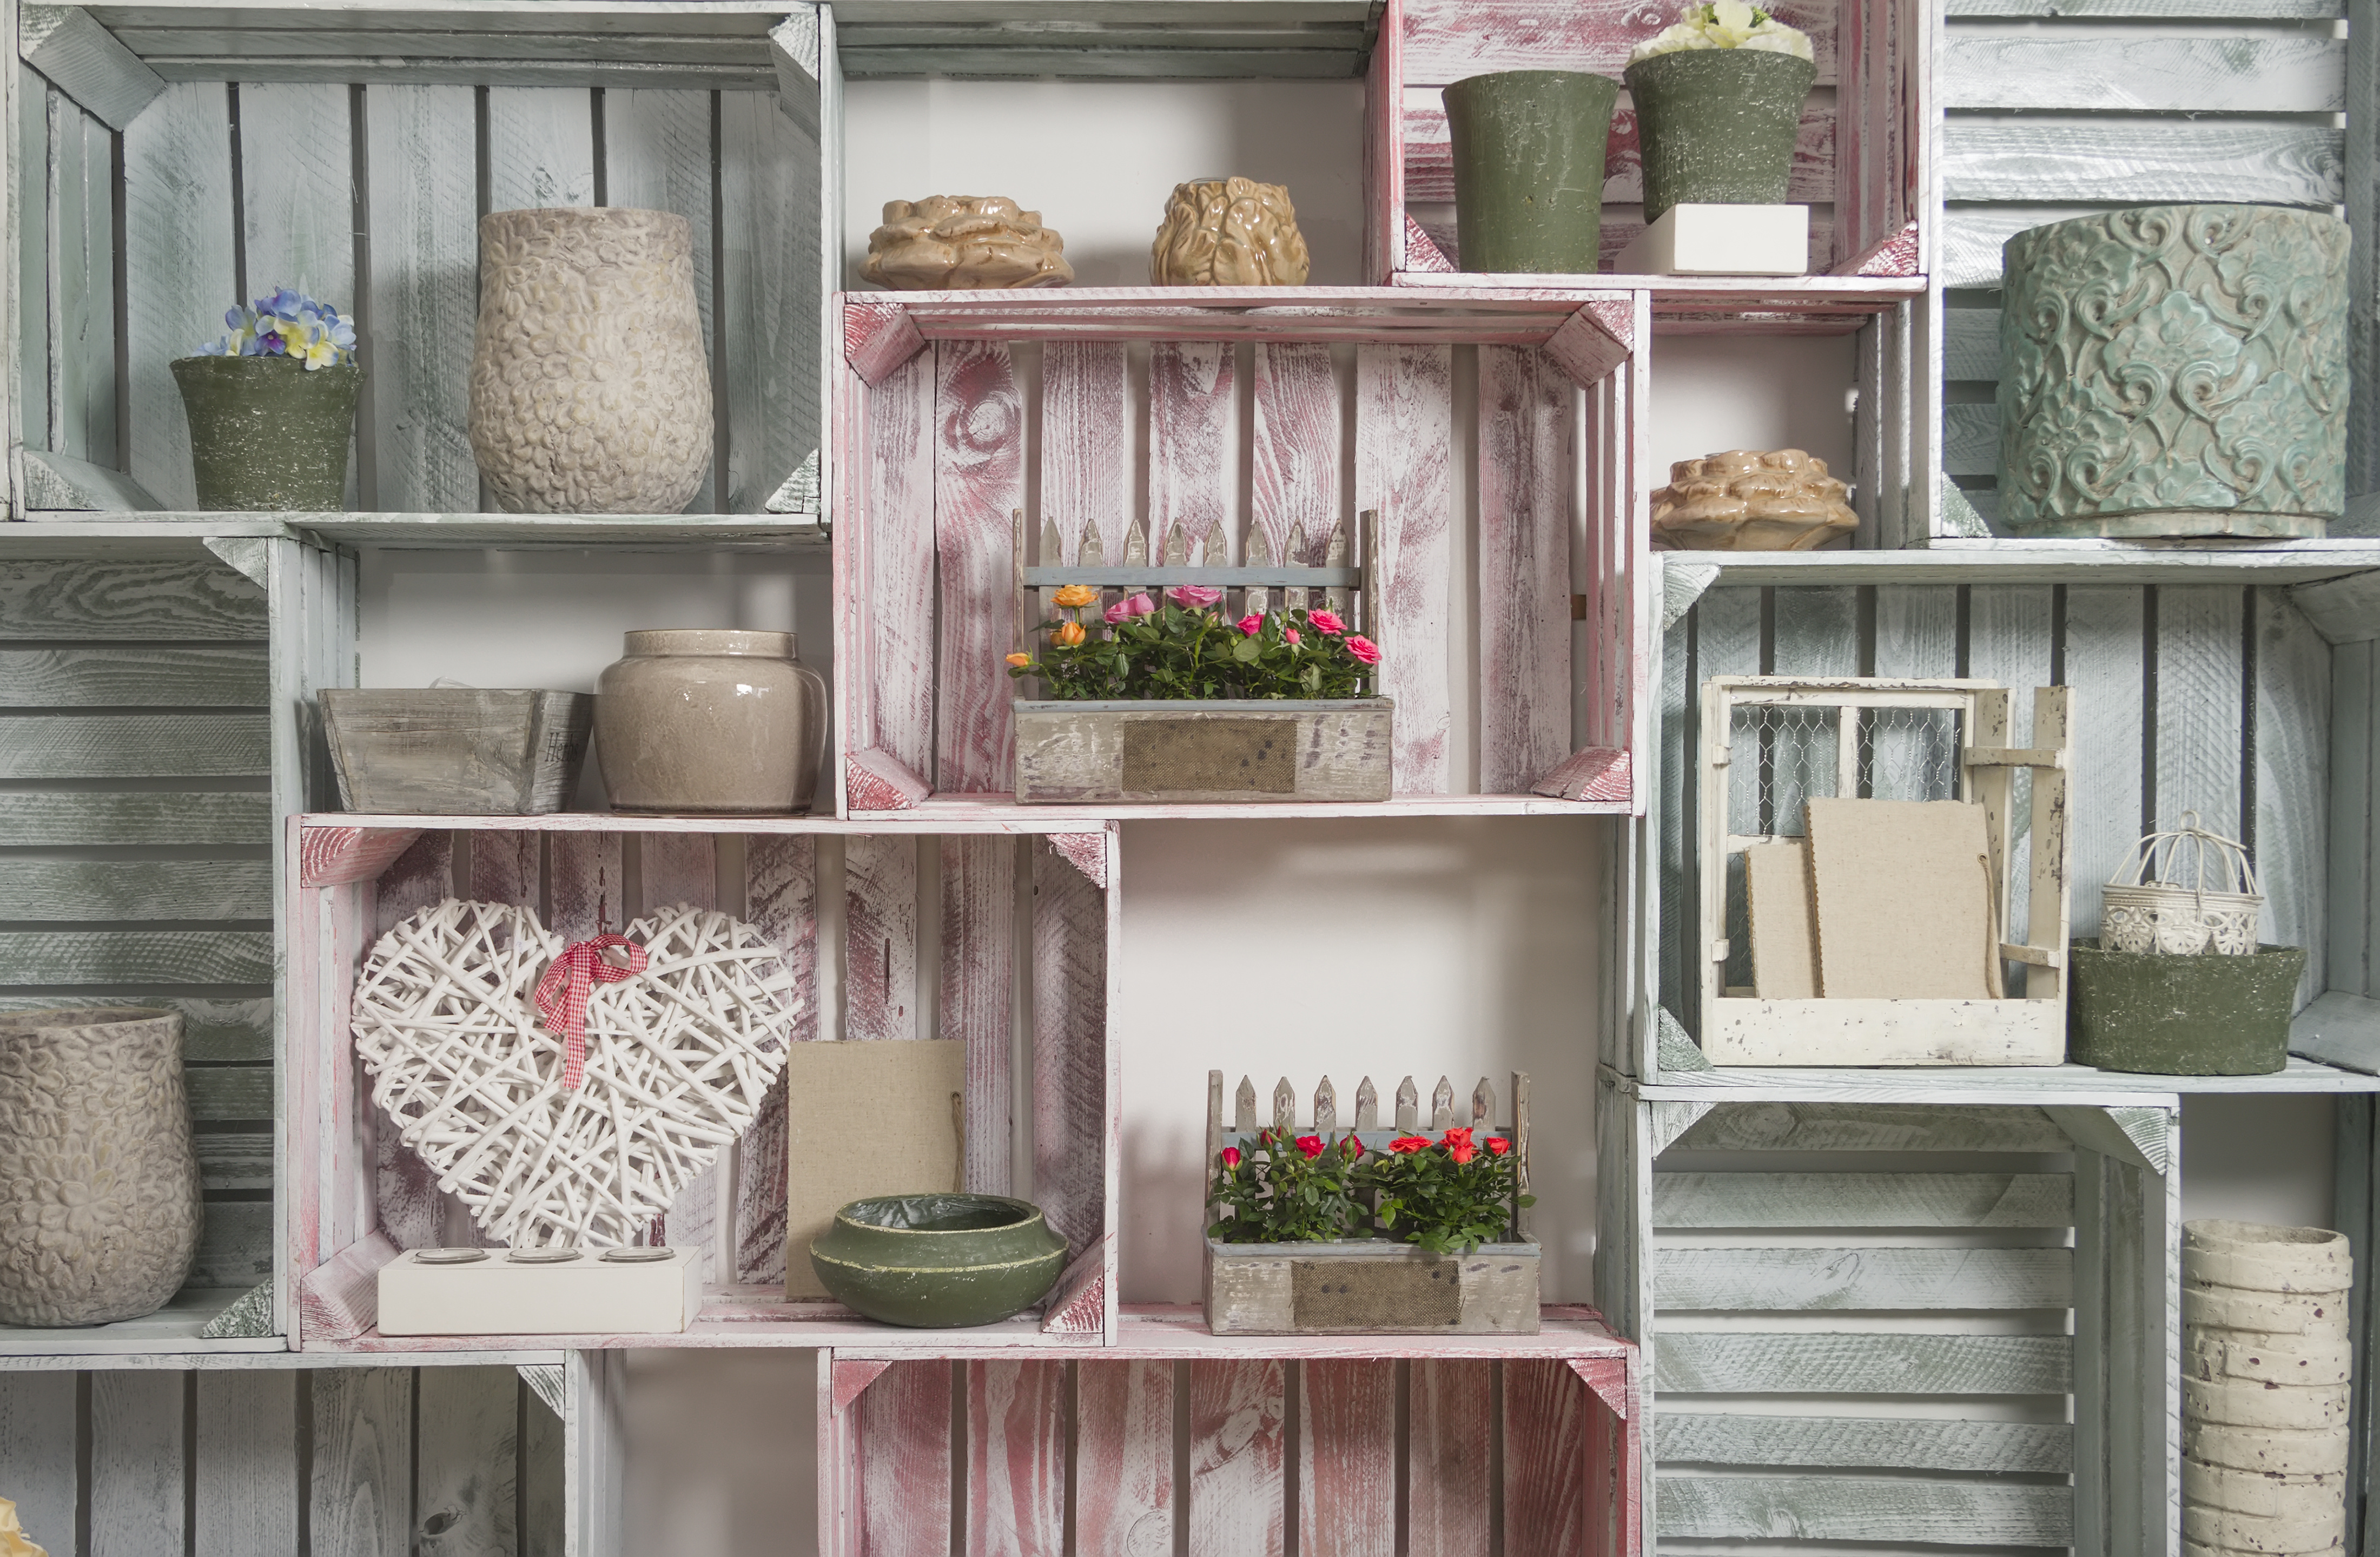 The Crafty Kitty | Vanilla, Chocolate and Strawberry Playdough